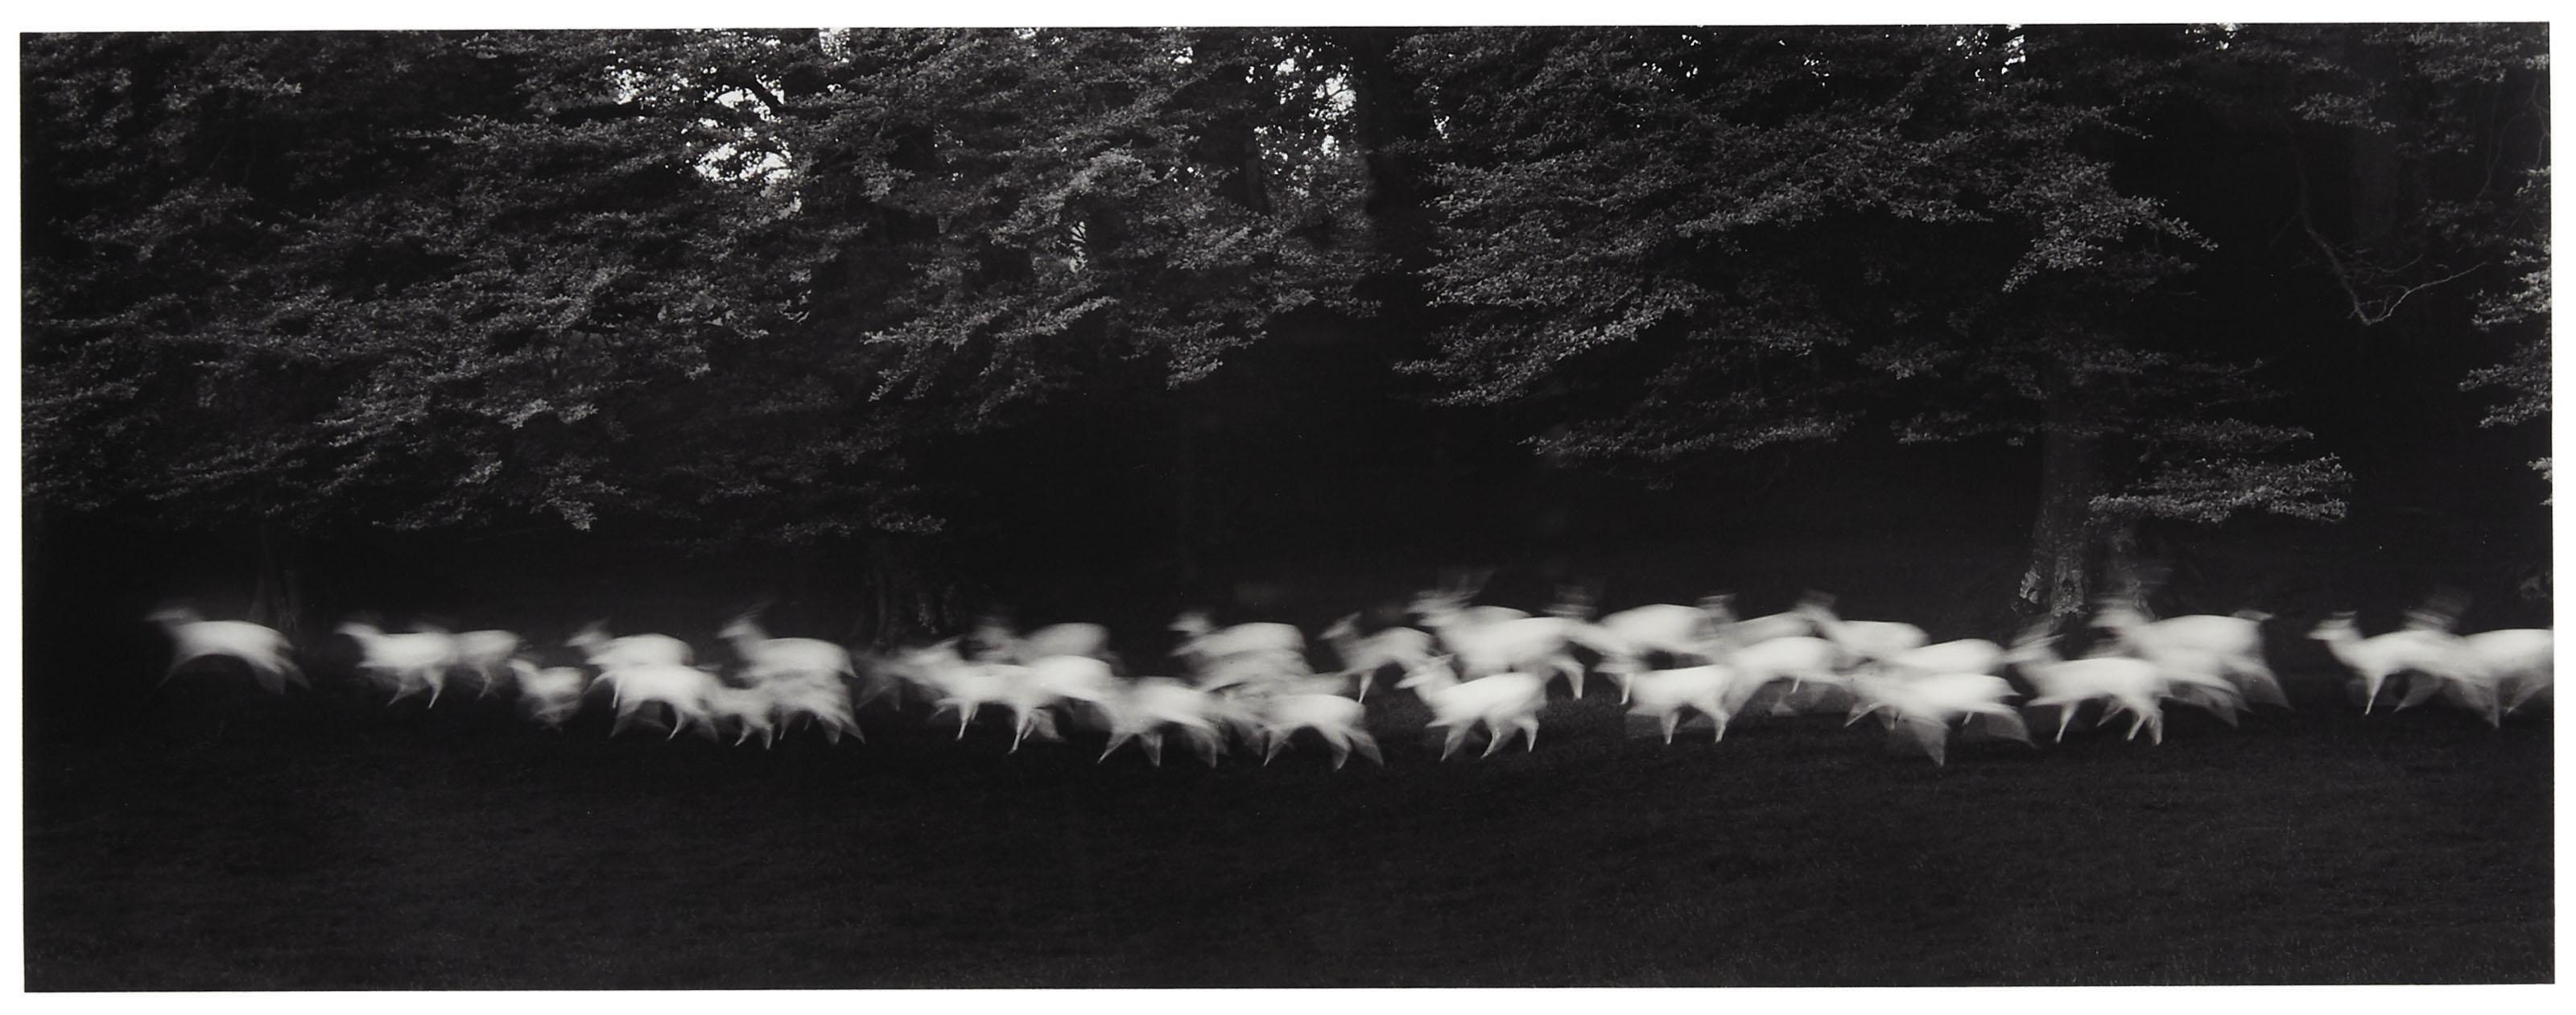 Running White Deer, Wicklow, Ireland, 1967